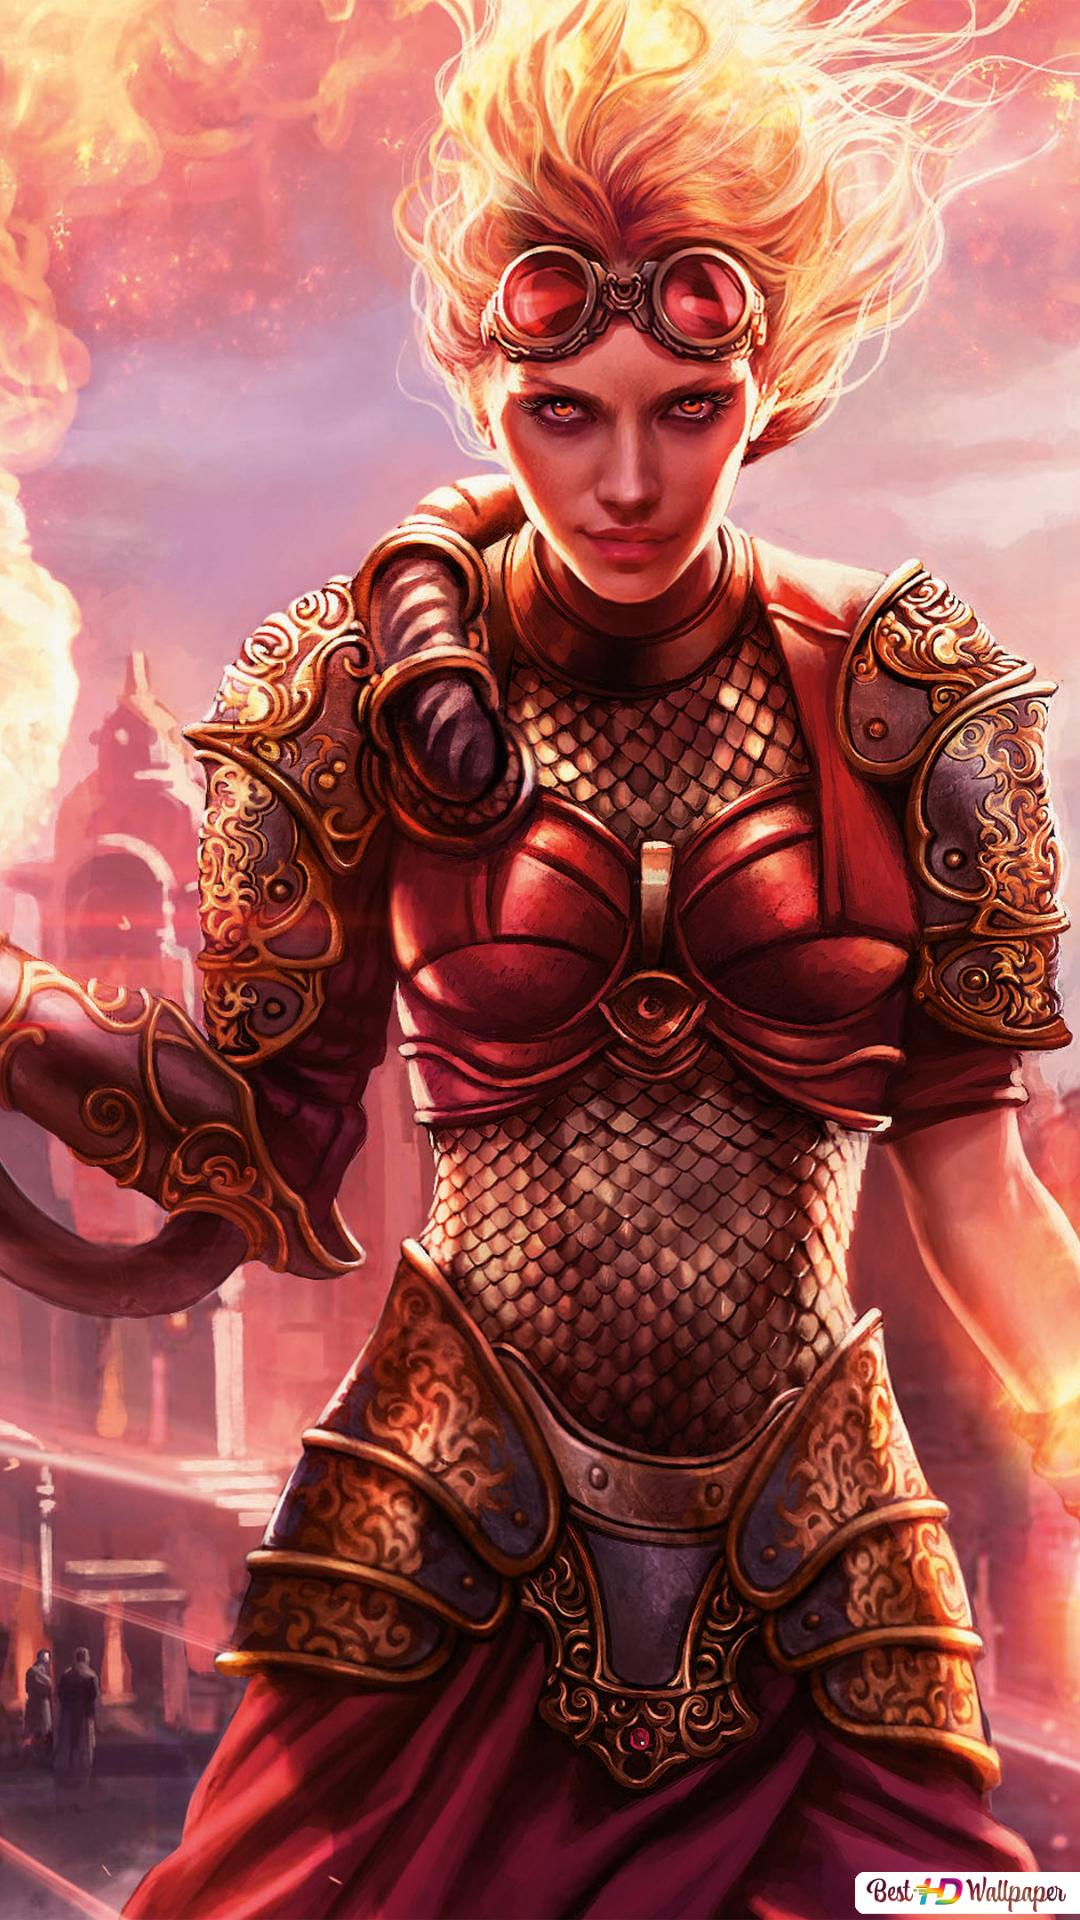 Magic: The Gathering - Arena HD wallpaper download